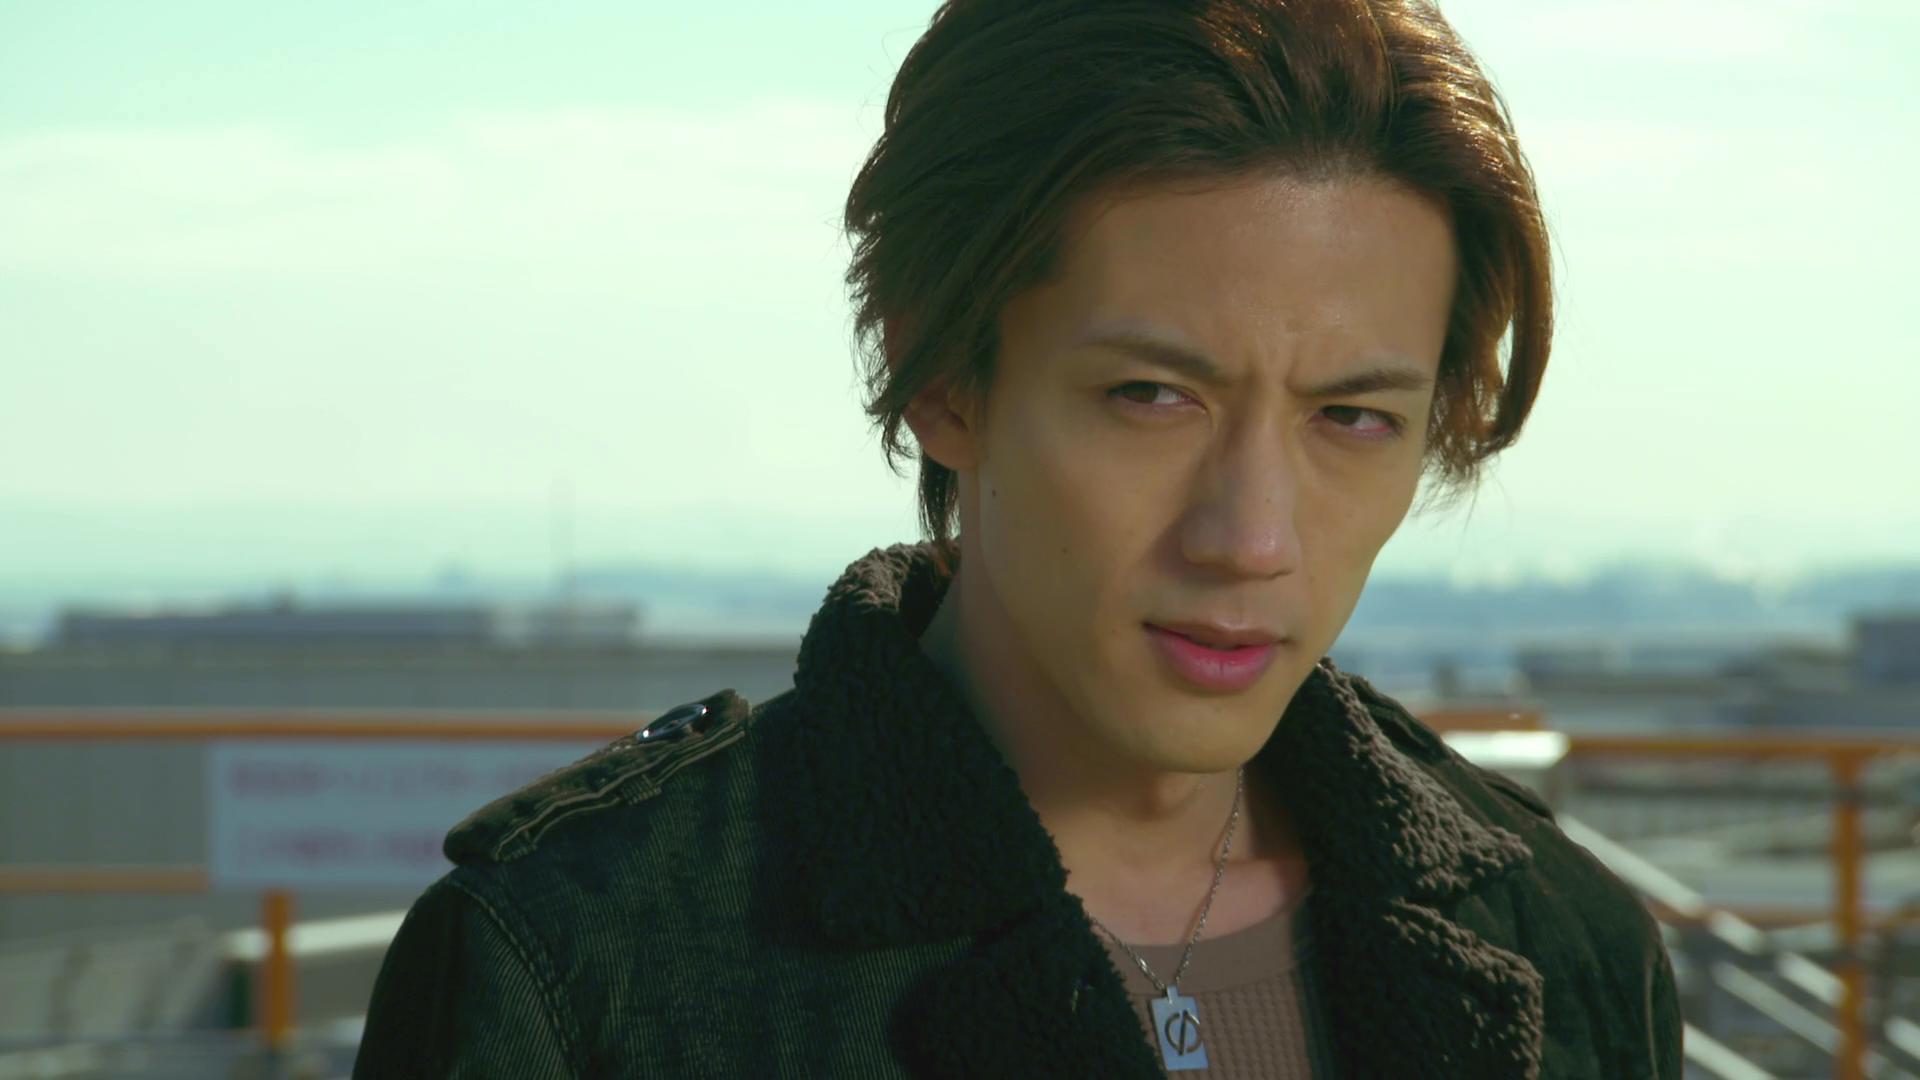 Takumi Inui | Kamen Rider Wiki | Fandom